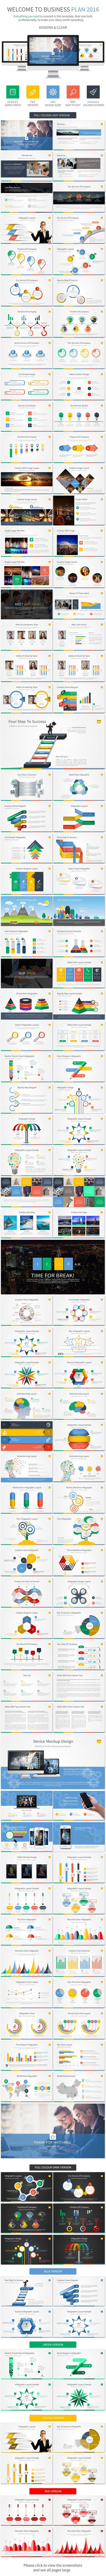 Business Plan Keynote Template Pinterest Business Planning - Fresh restaurant presentation template scheme